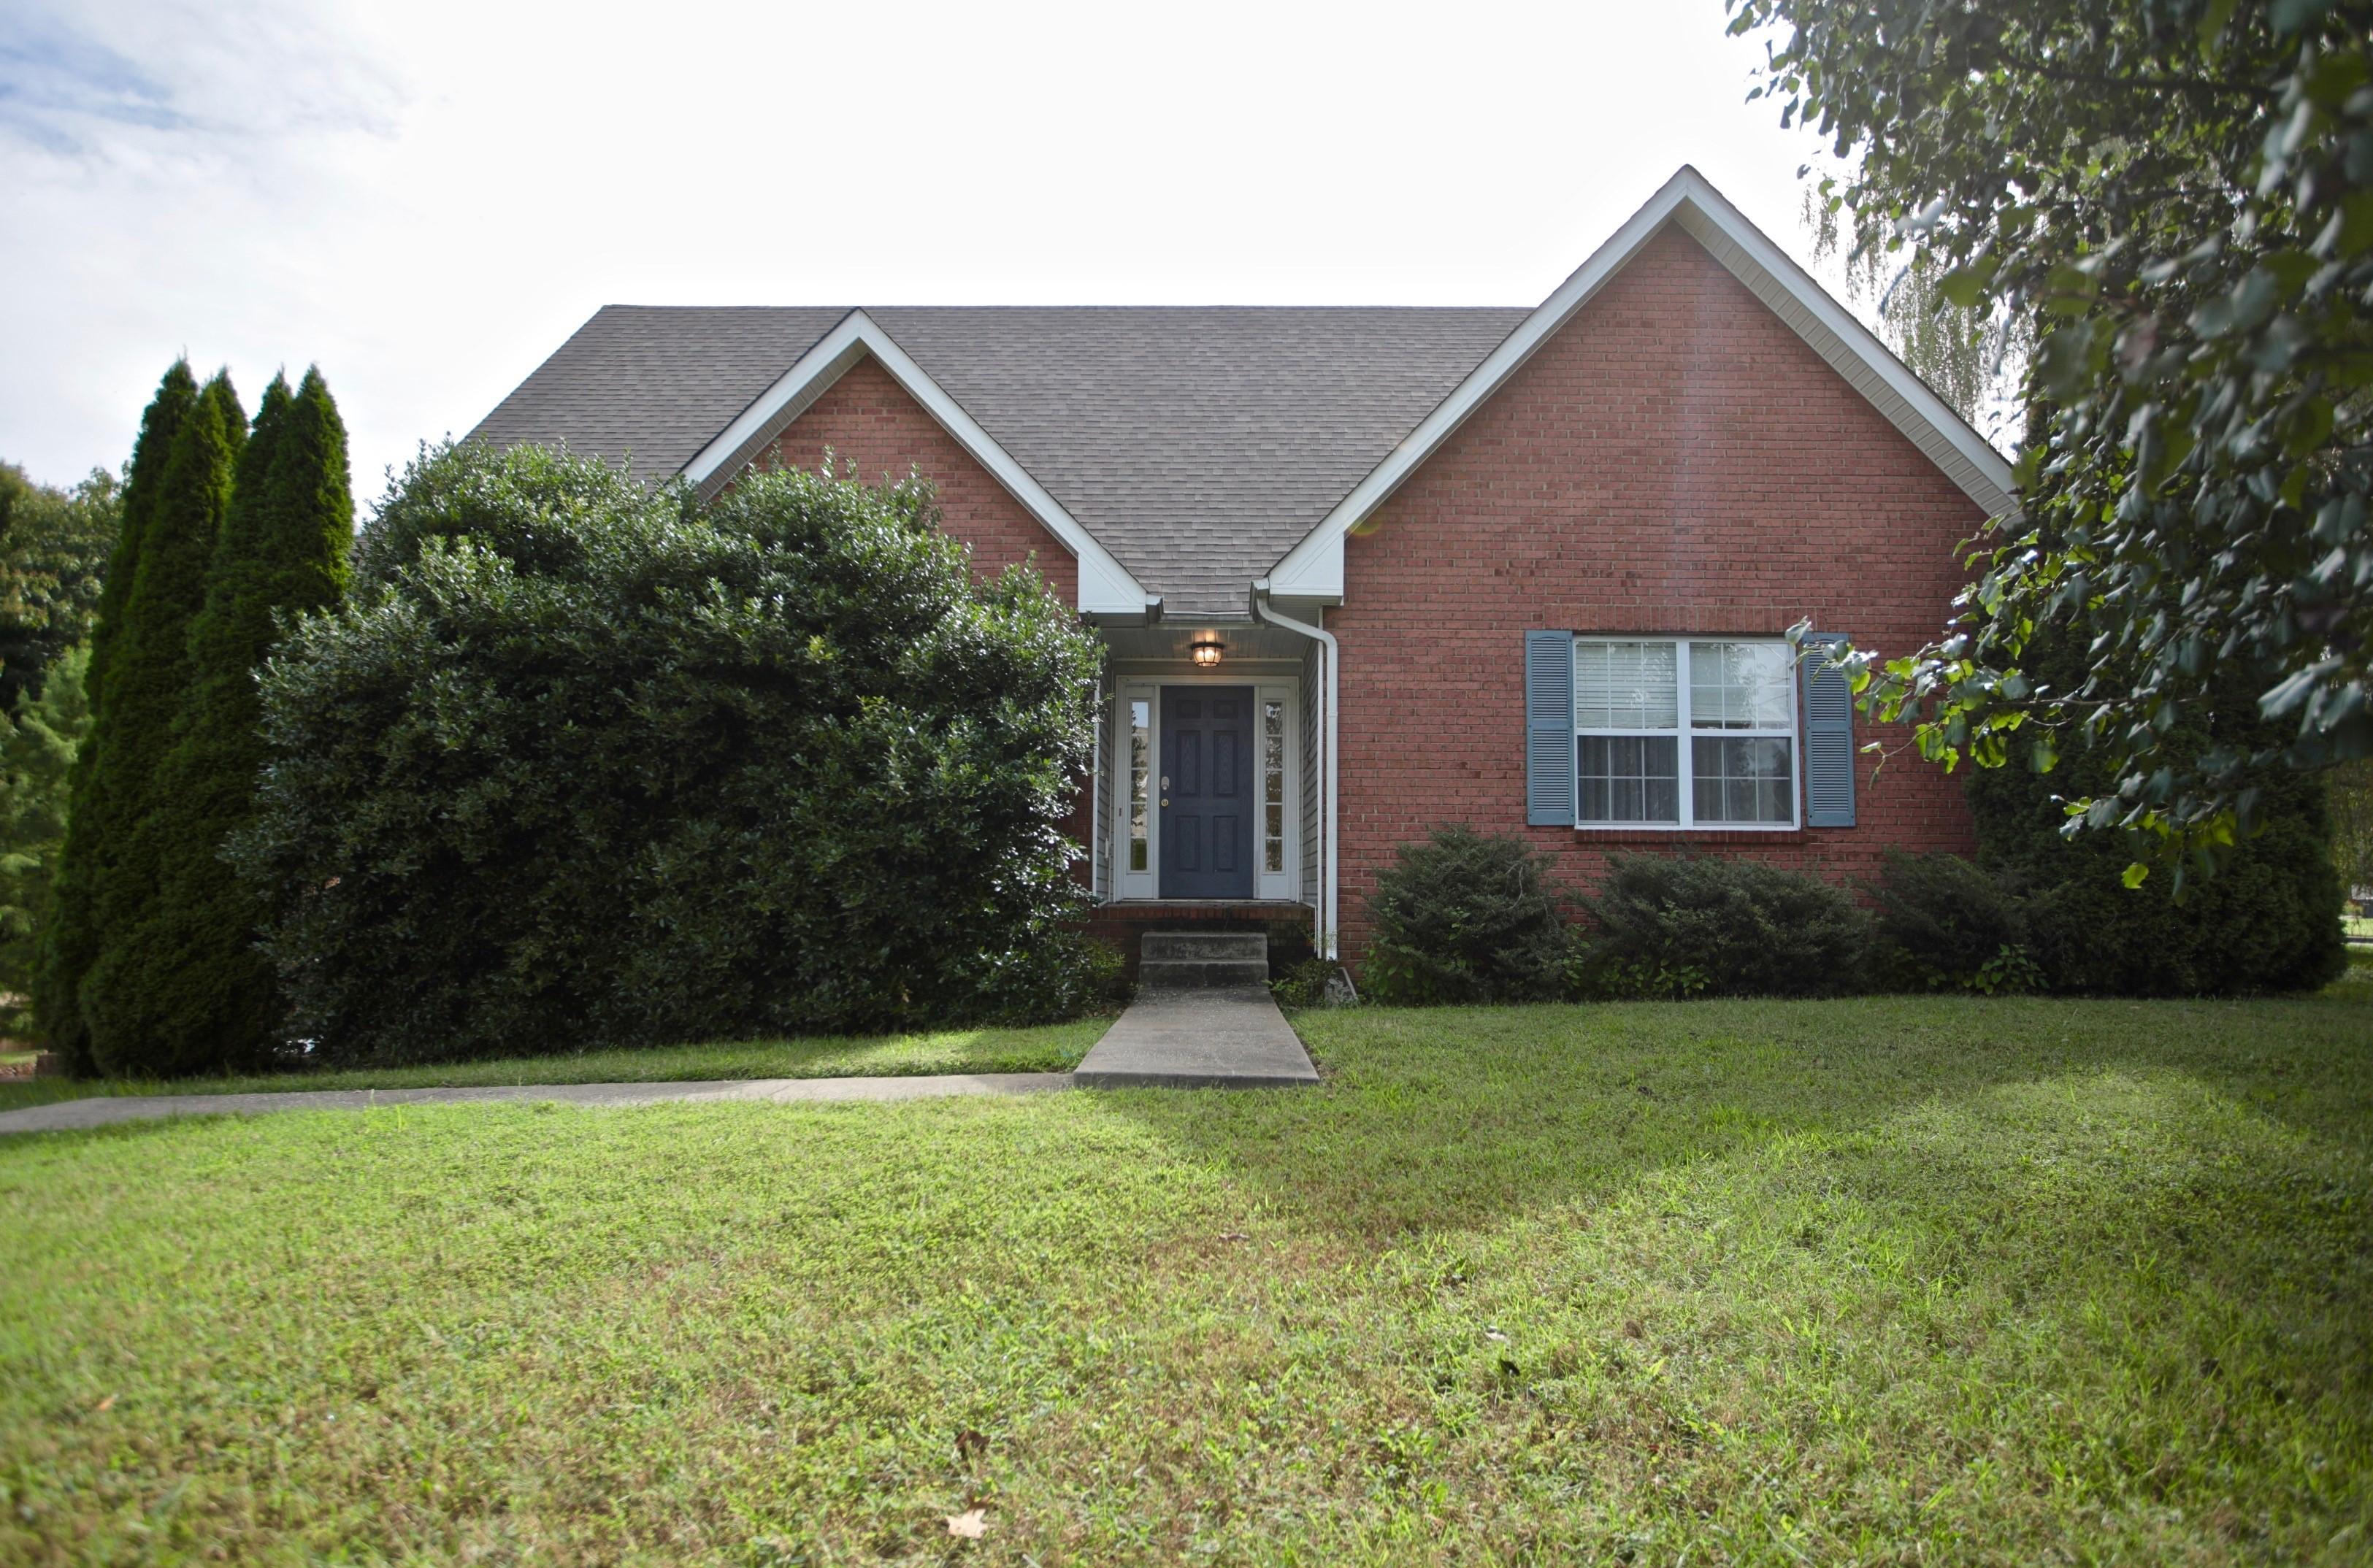 1597 Windriver Rd. Clarksville, TN 37042